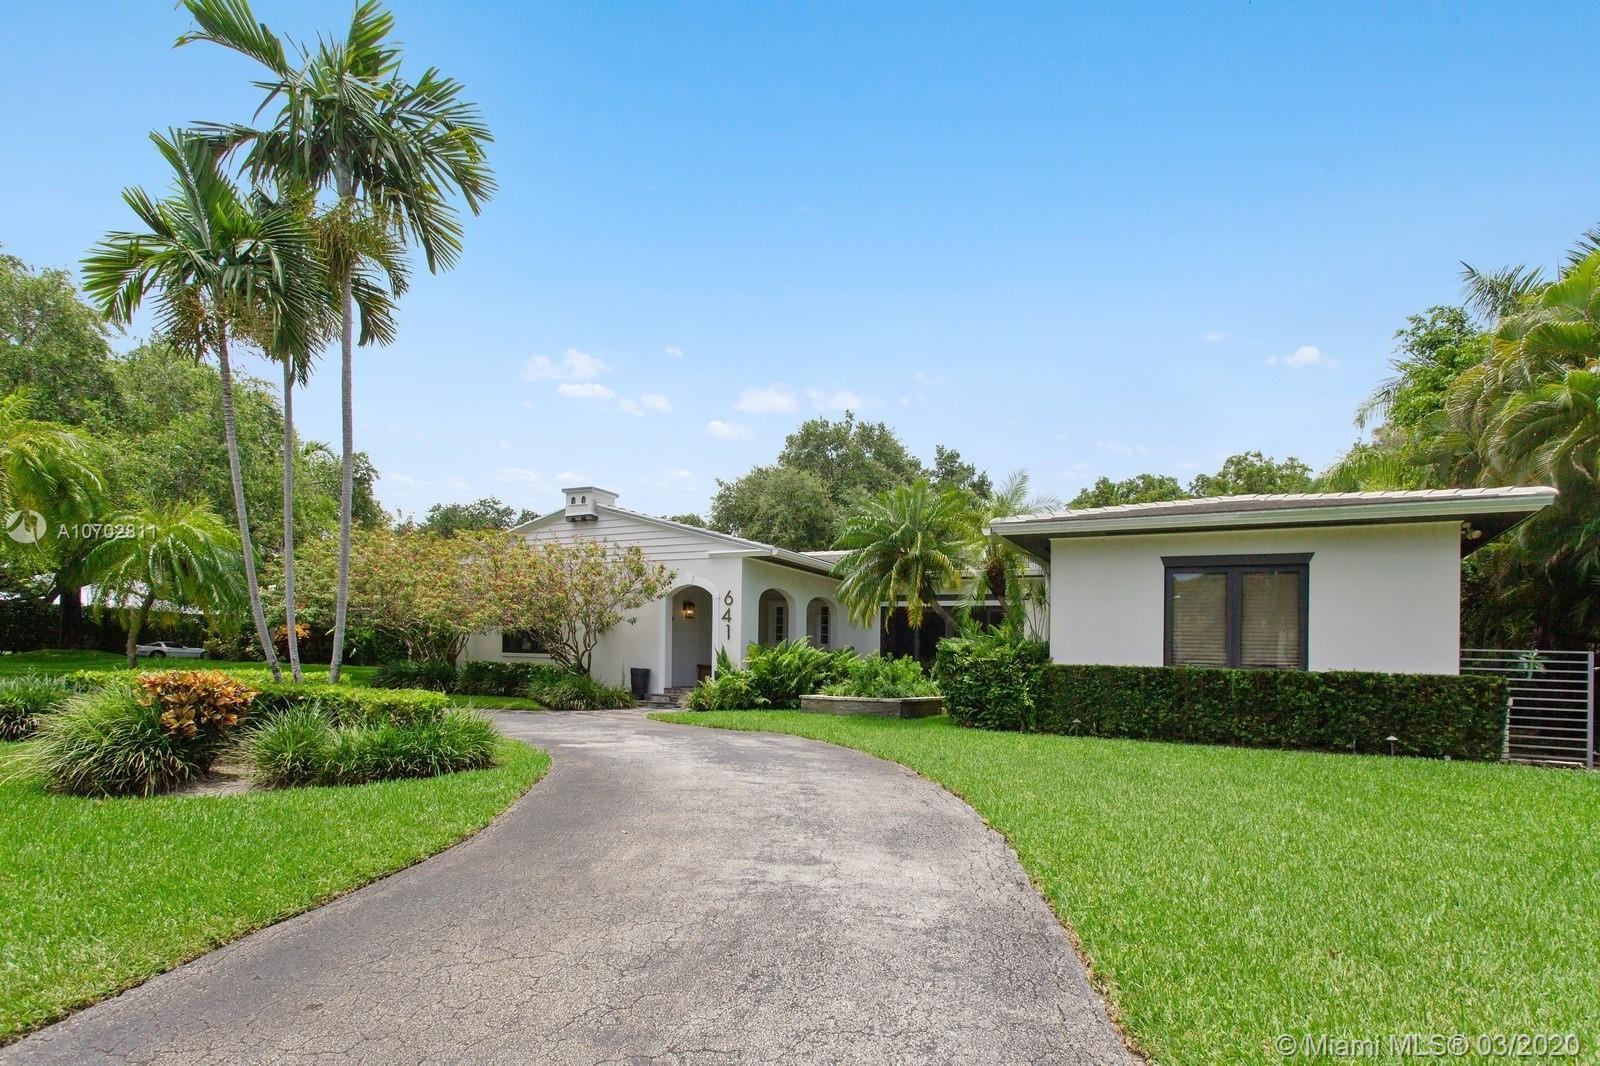 641 Island Rd, Miami, FL 33137